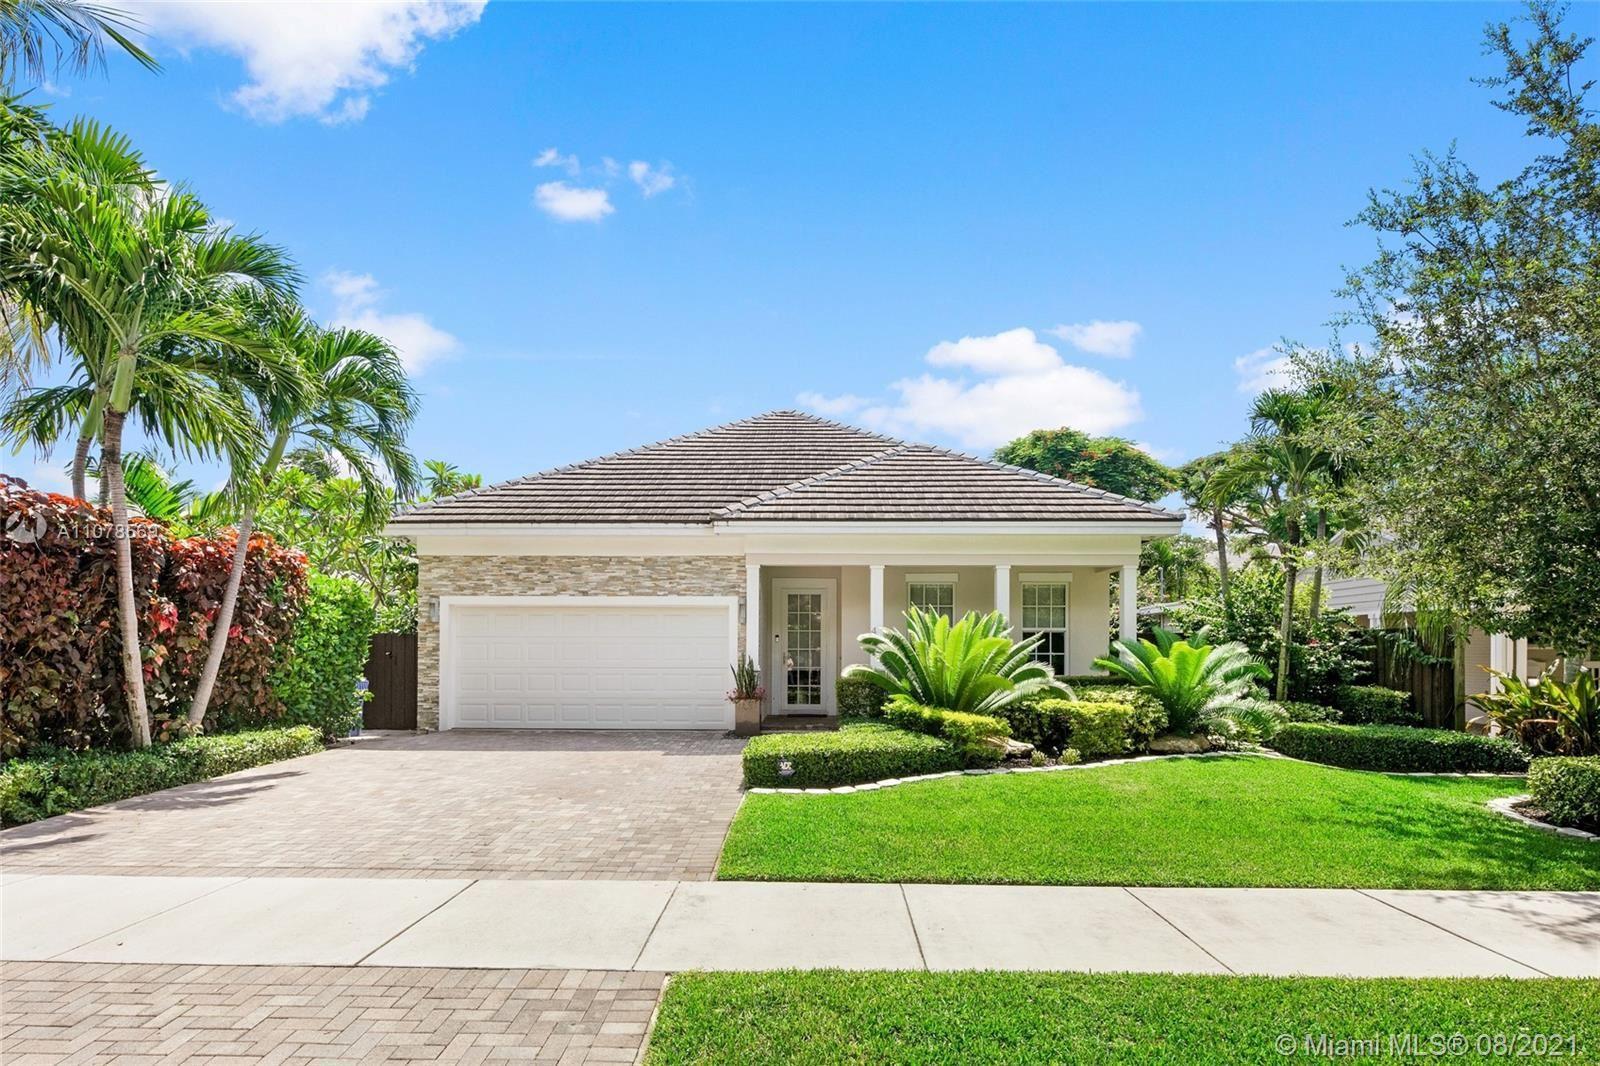 430 NE 11th Ave, Fort Lauderdale, FL 33301 - #: A11078569